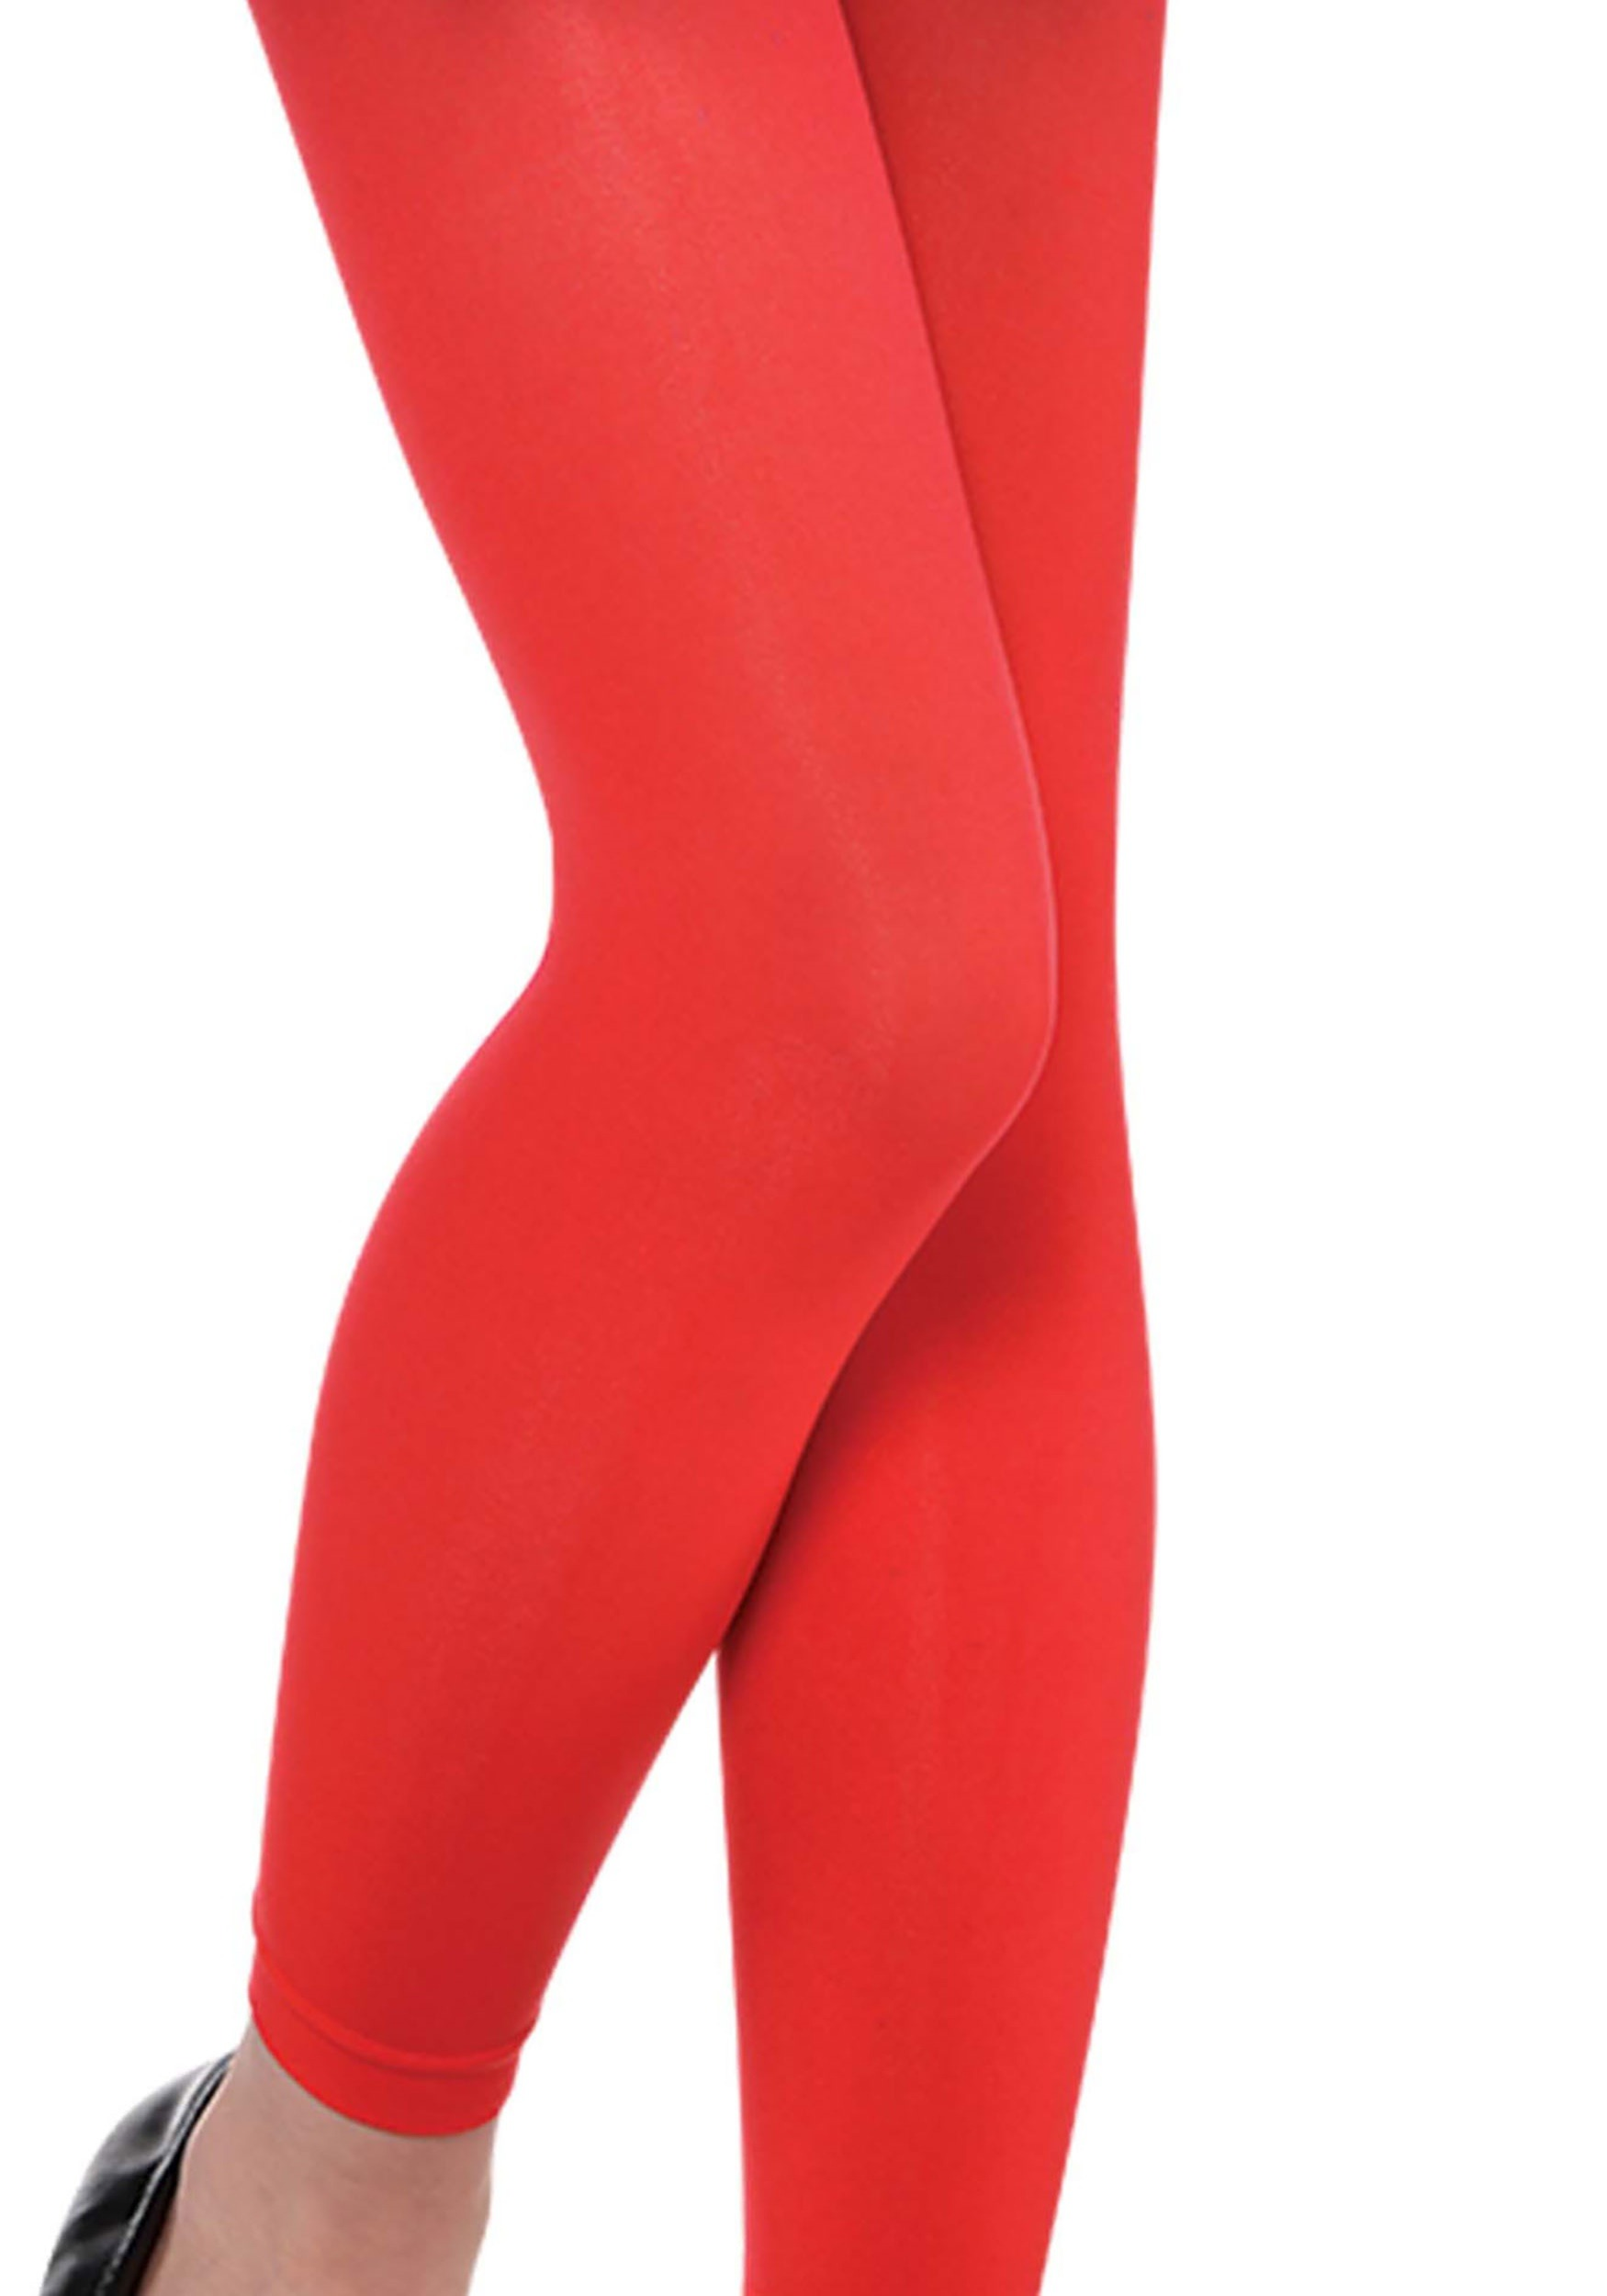 Ladies Red Tights